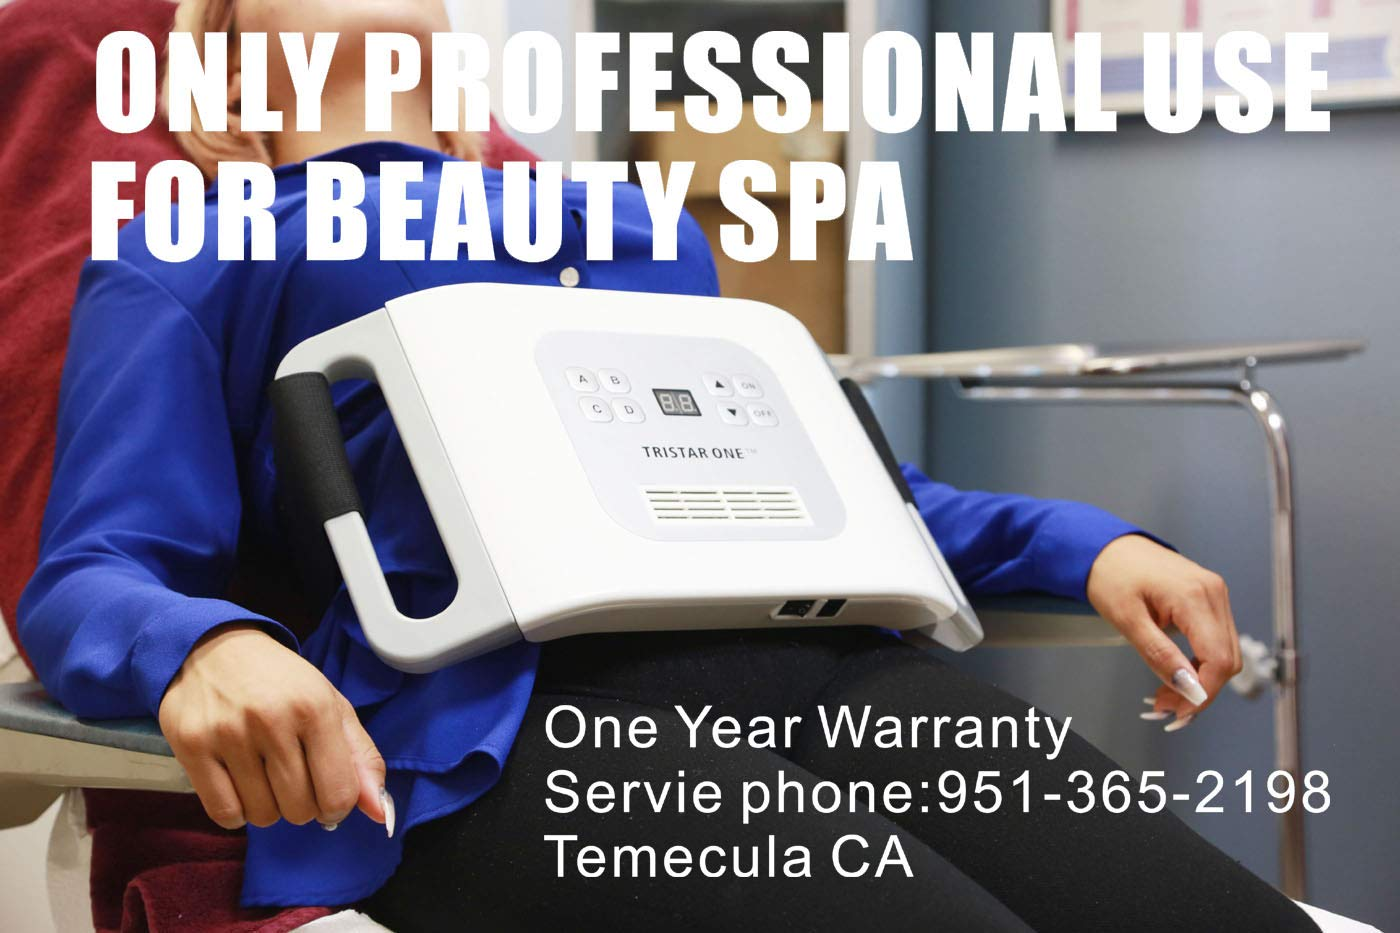 Professional beauty salon equipment fat reduce device L-I-P-O L-A-S-E-R system-HKS902D